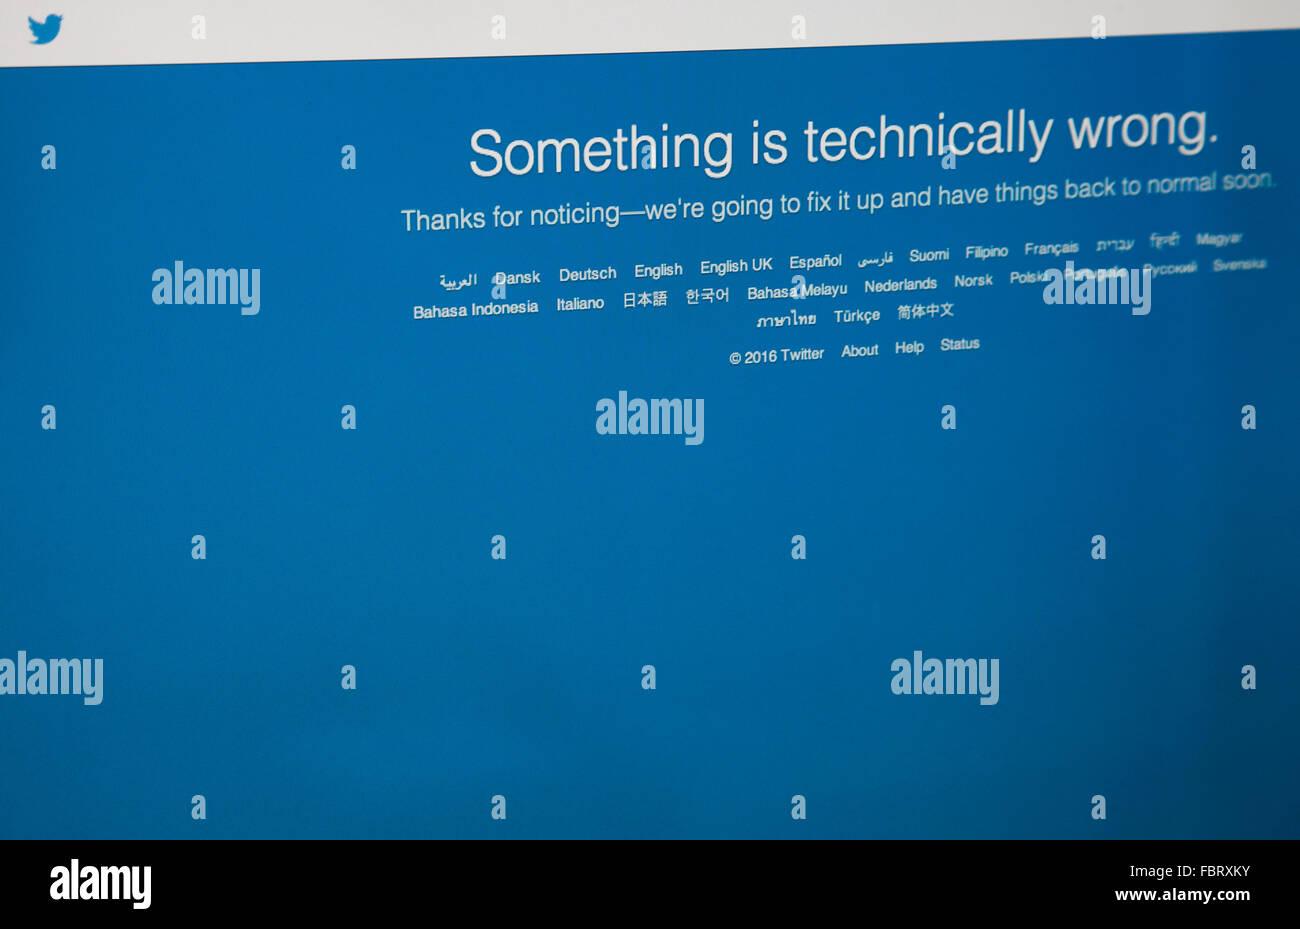 London UK, 19 January 2016 Twitter Down For Millions Of Users Worldwide - Twitter fell offline on this morning, - Stock Image